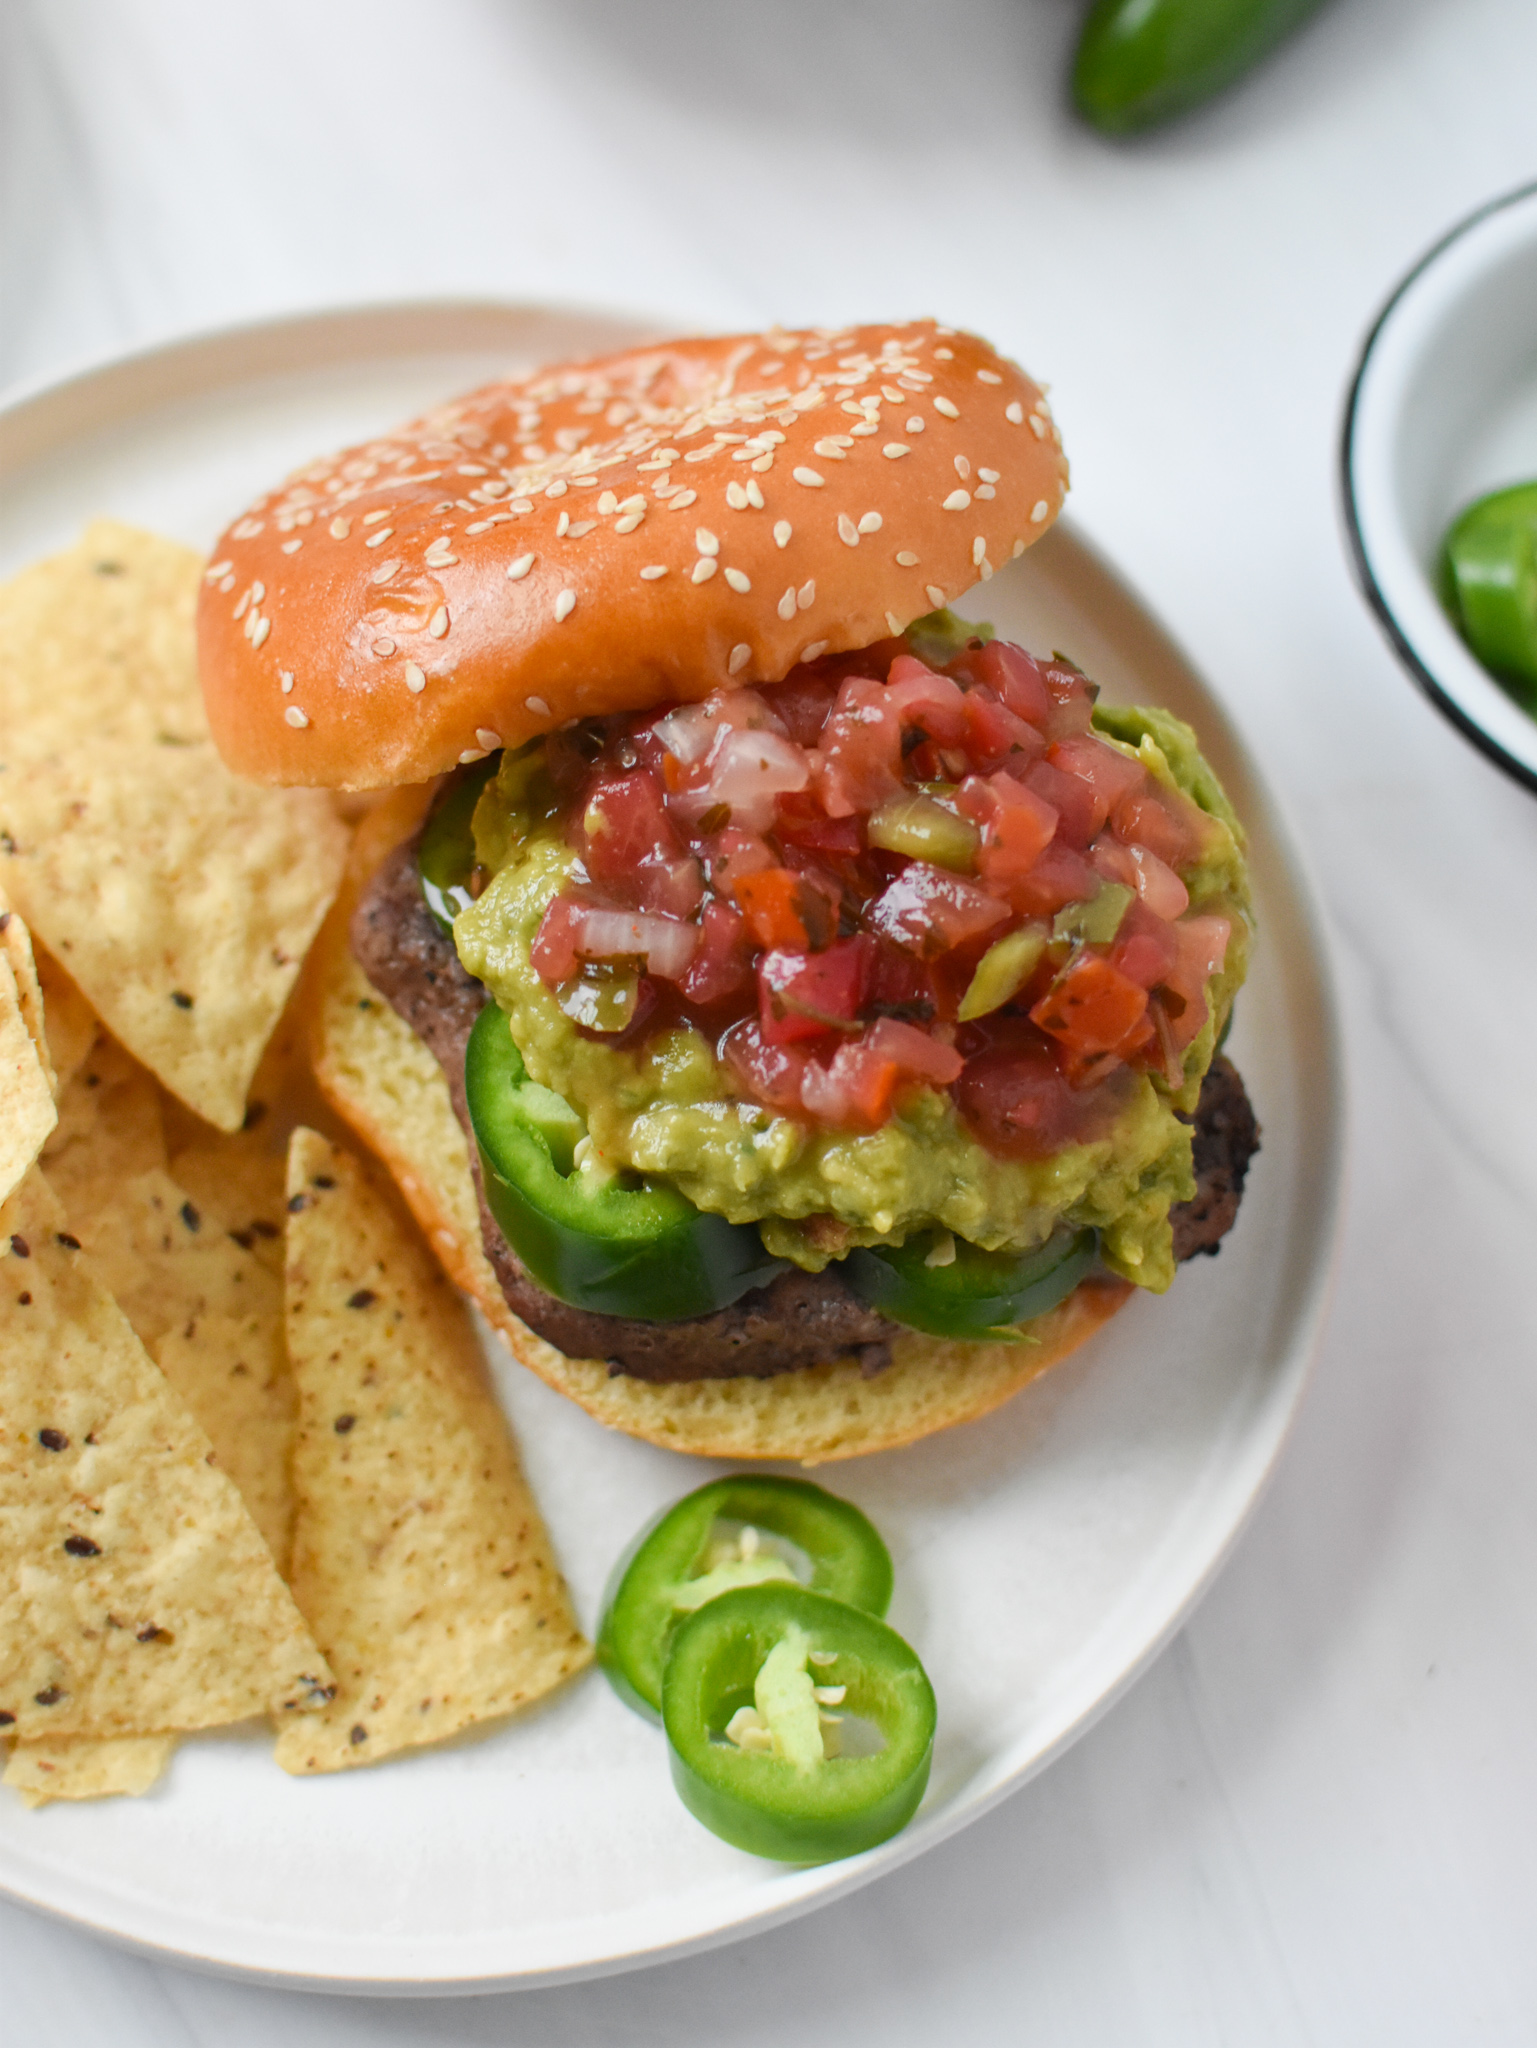 Tex Mex Burger with jalapeños.